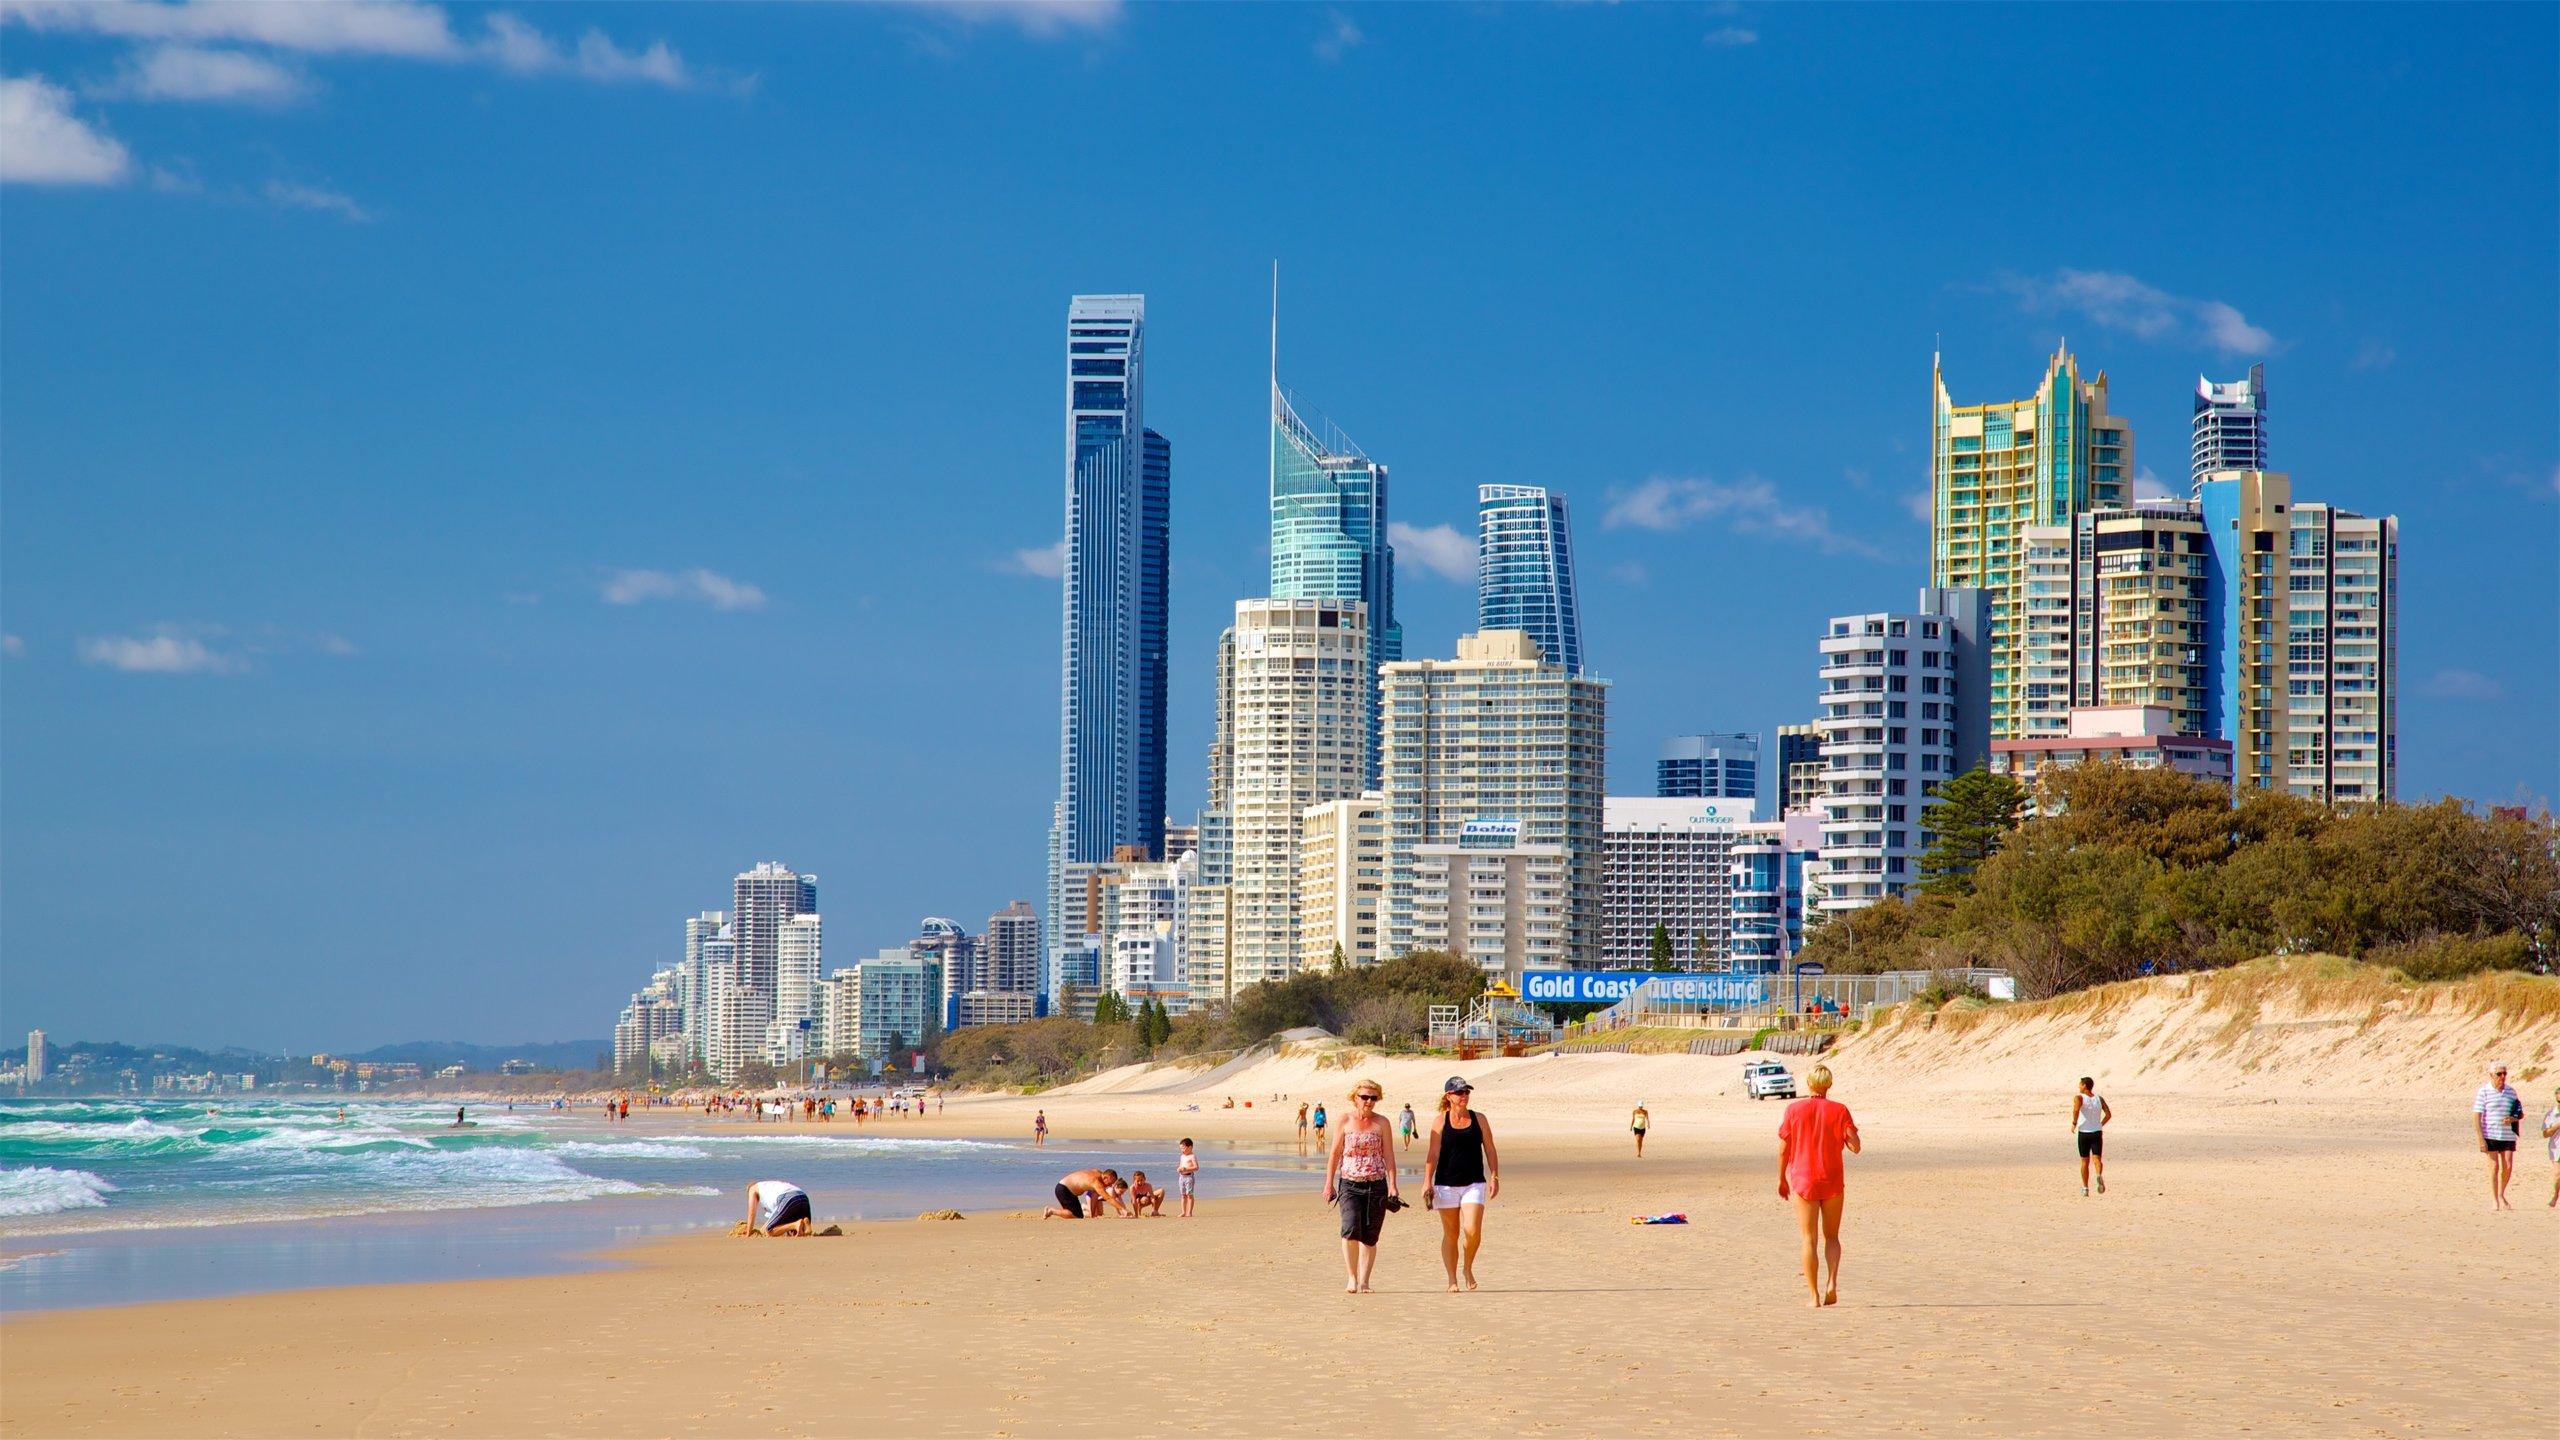 Southport, Gold Coast, Queensland, Australia